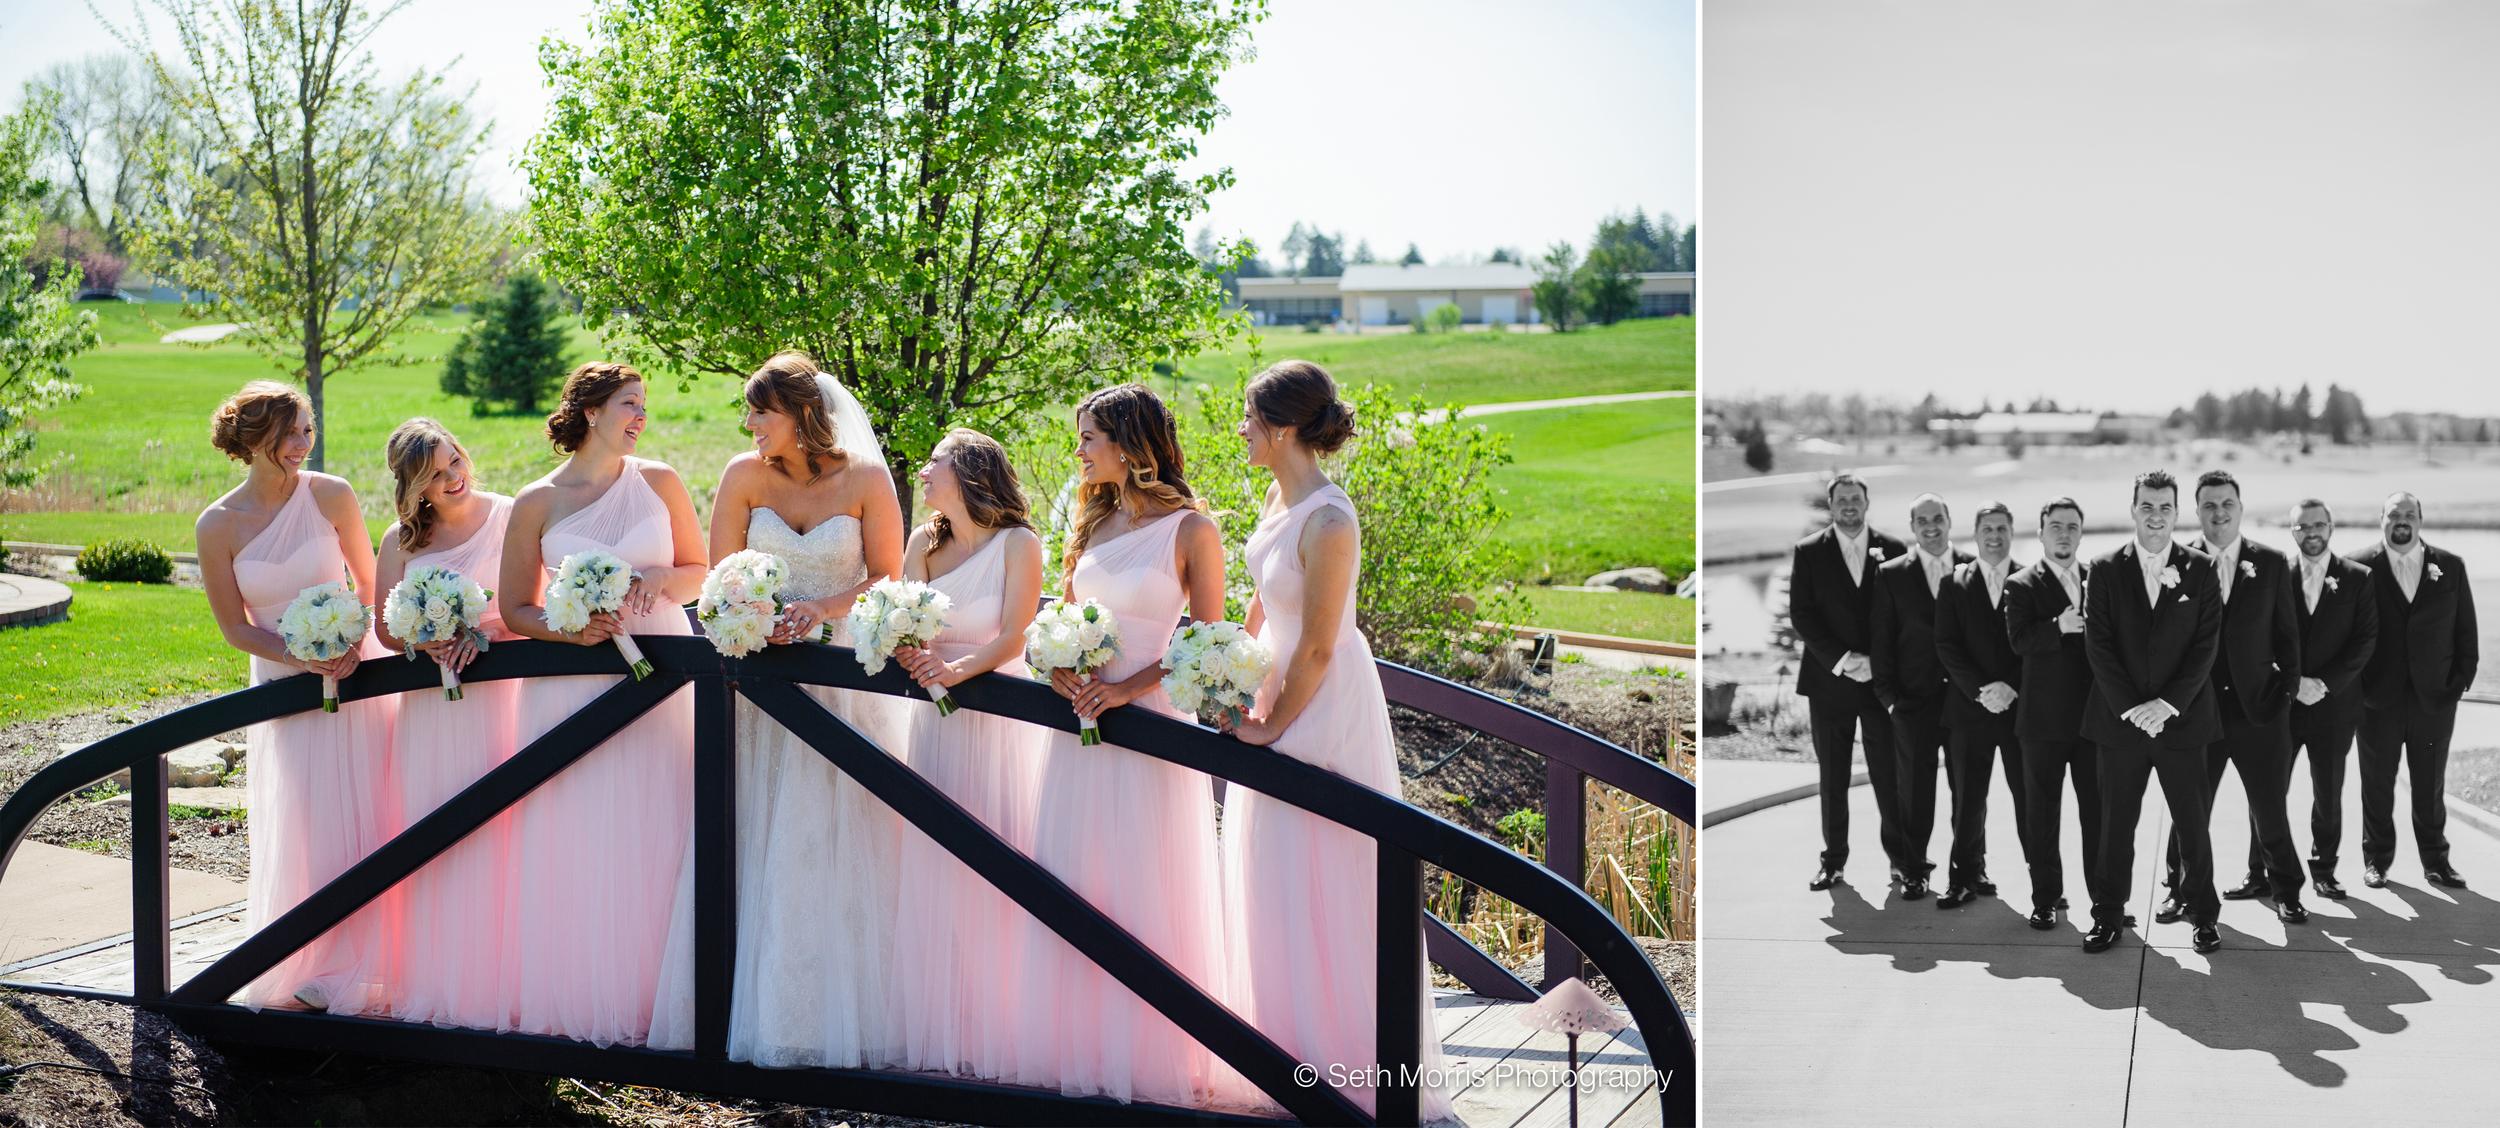 metamora-fields-wedding-photgrapher-peoria-151.jpg